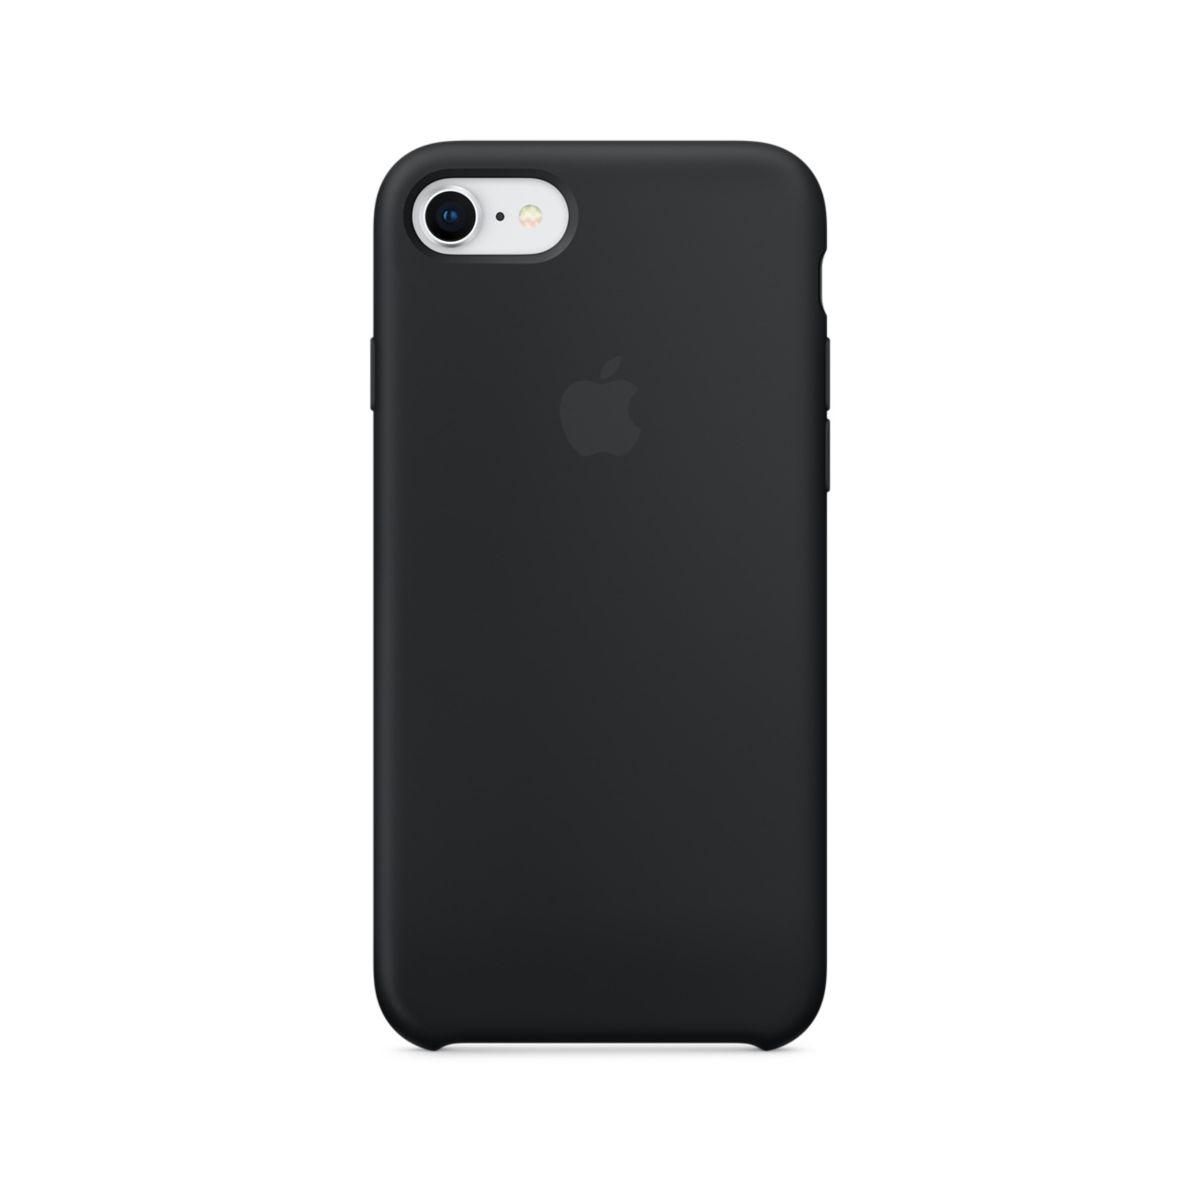 Coque APPLE iPhone 7/8 silicone noir (photo)